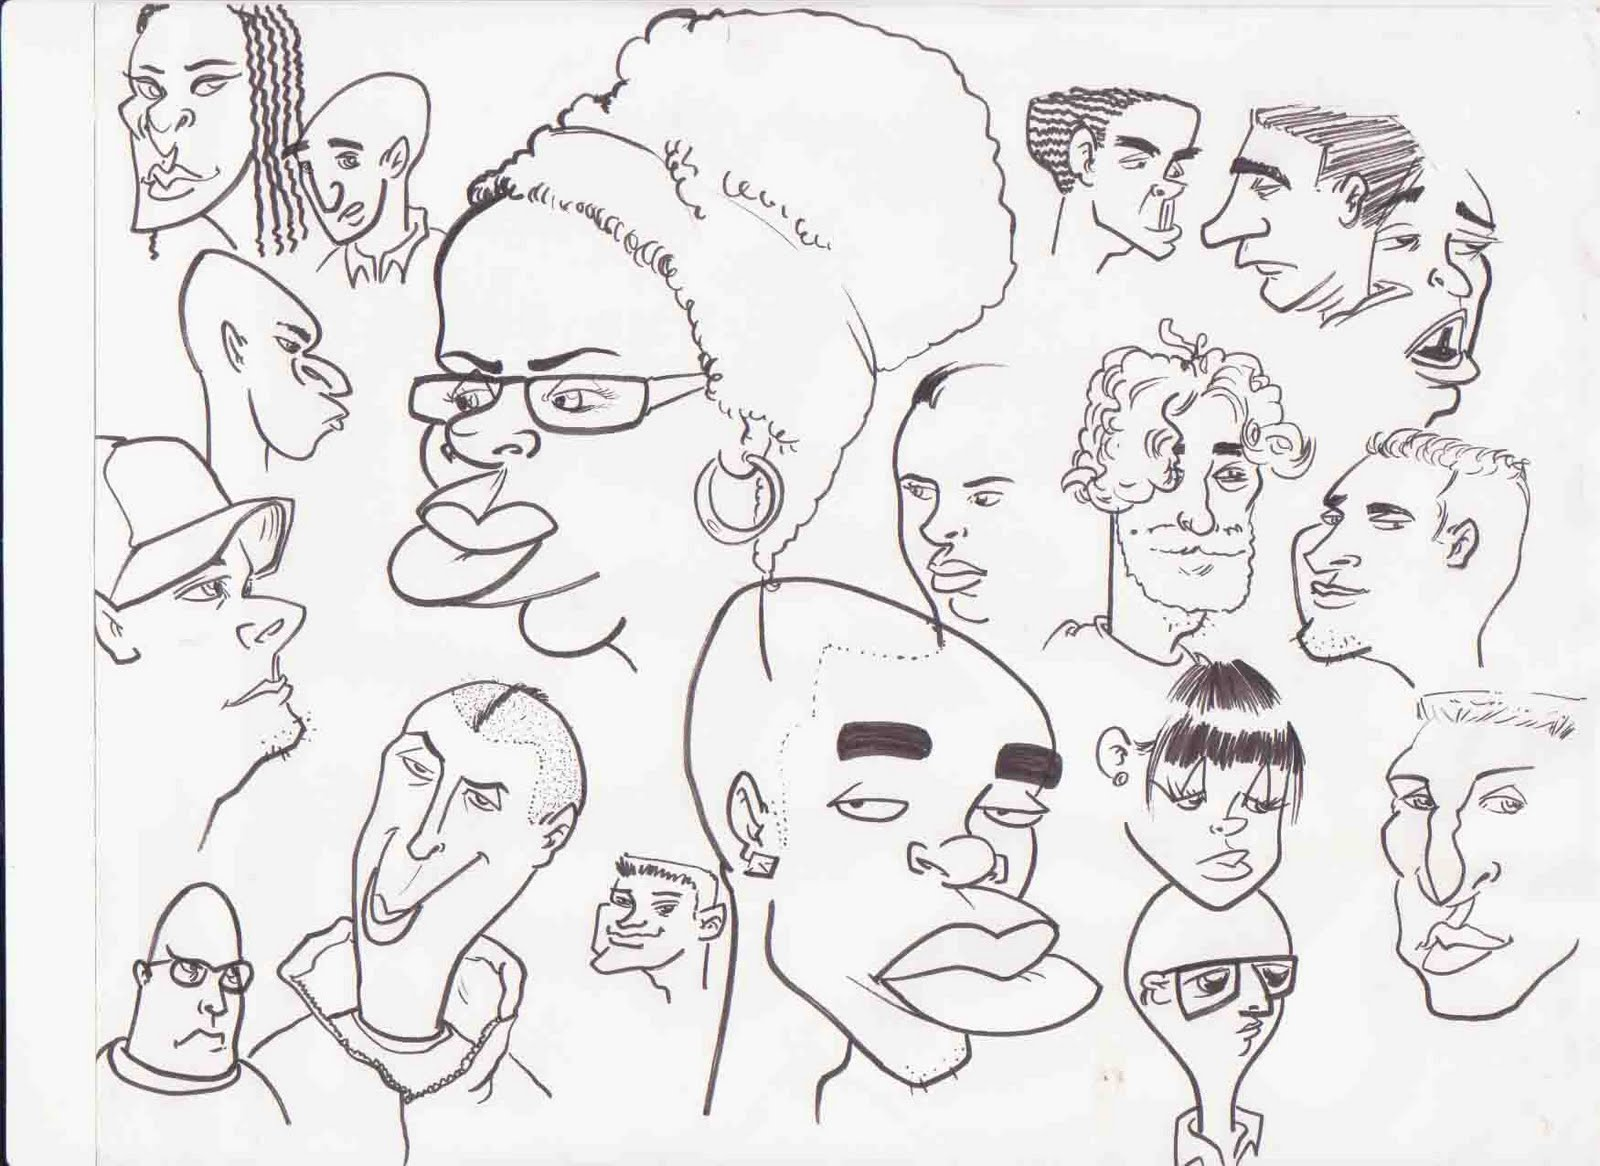 the art of mr.janikowski